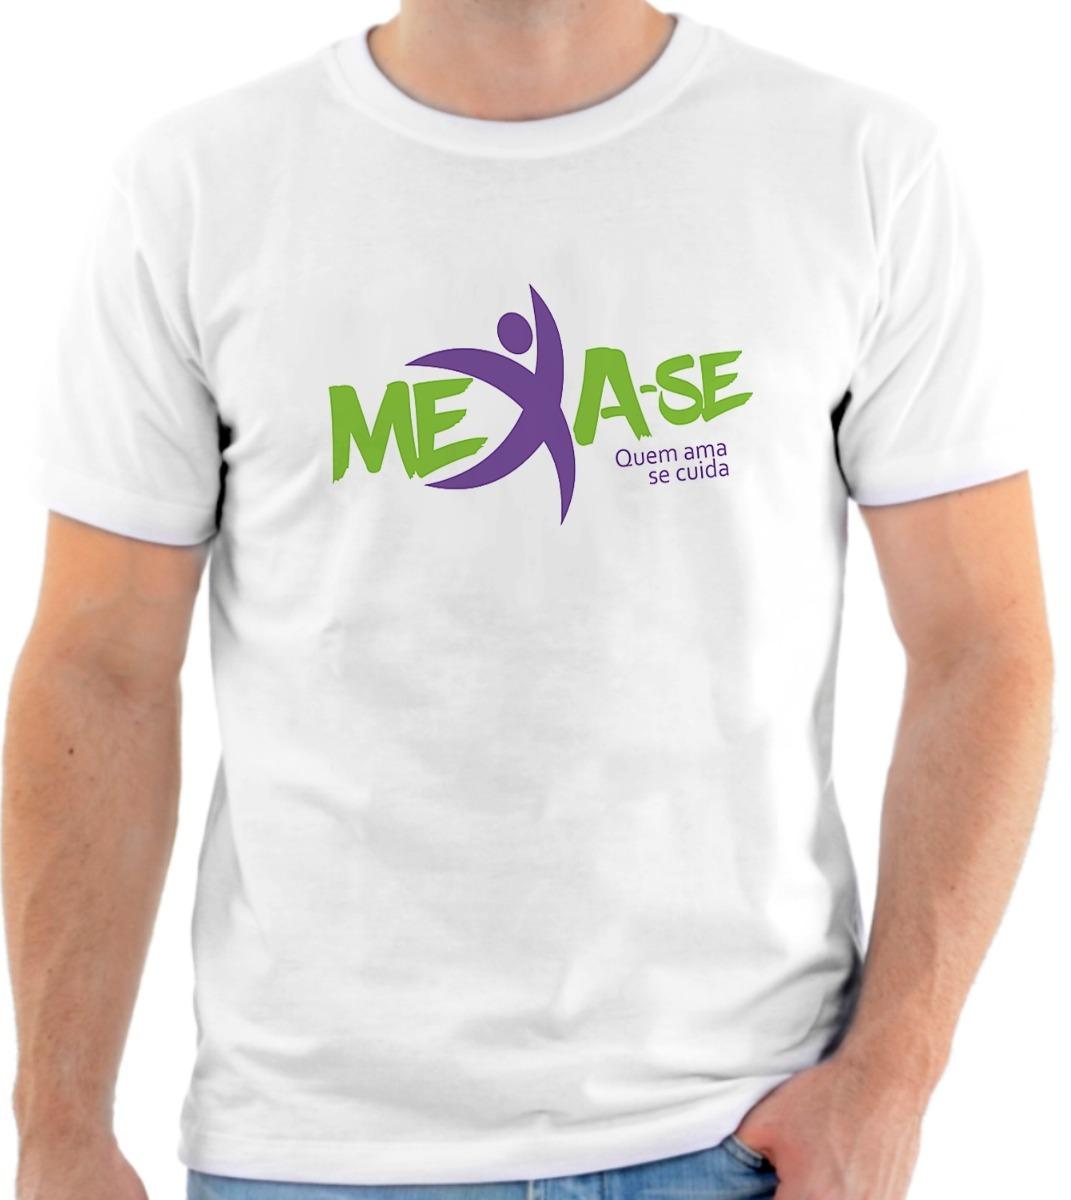 661b28b89 camiseta camisa personalizada mexa-se pela vida academia 2. Carregando zoom.